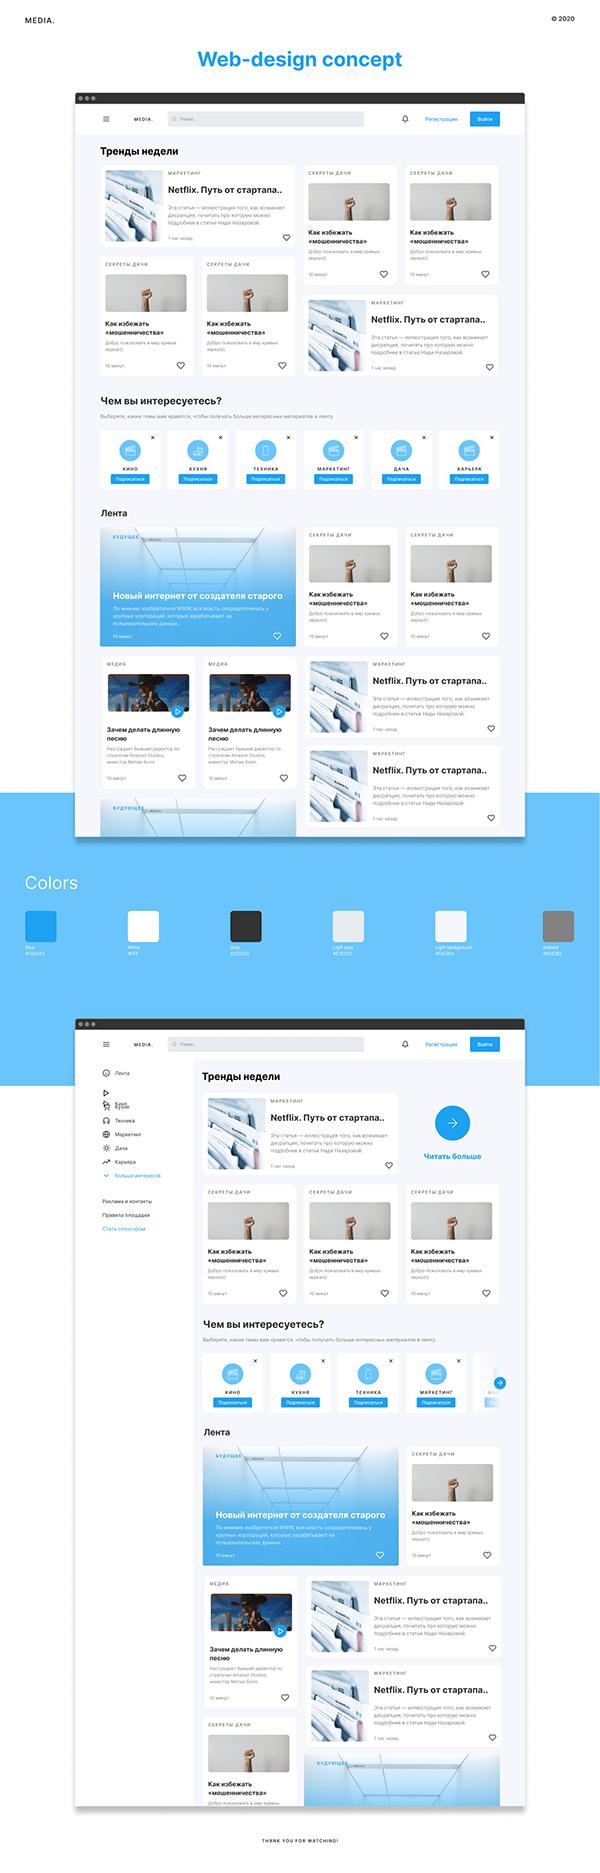 MEDIA. | Web-design concept